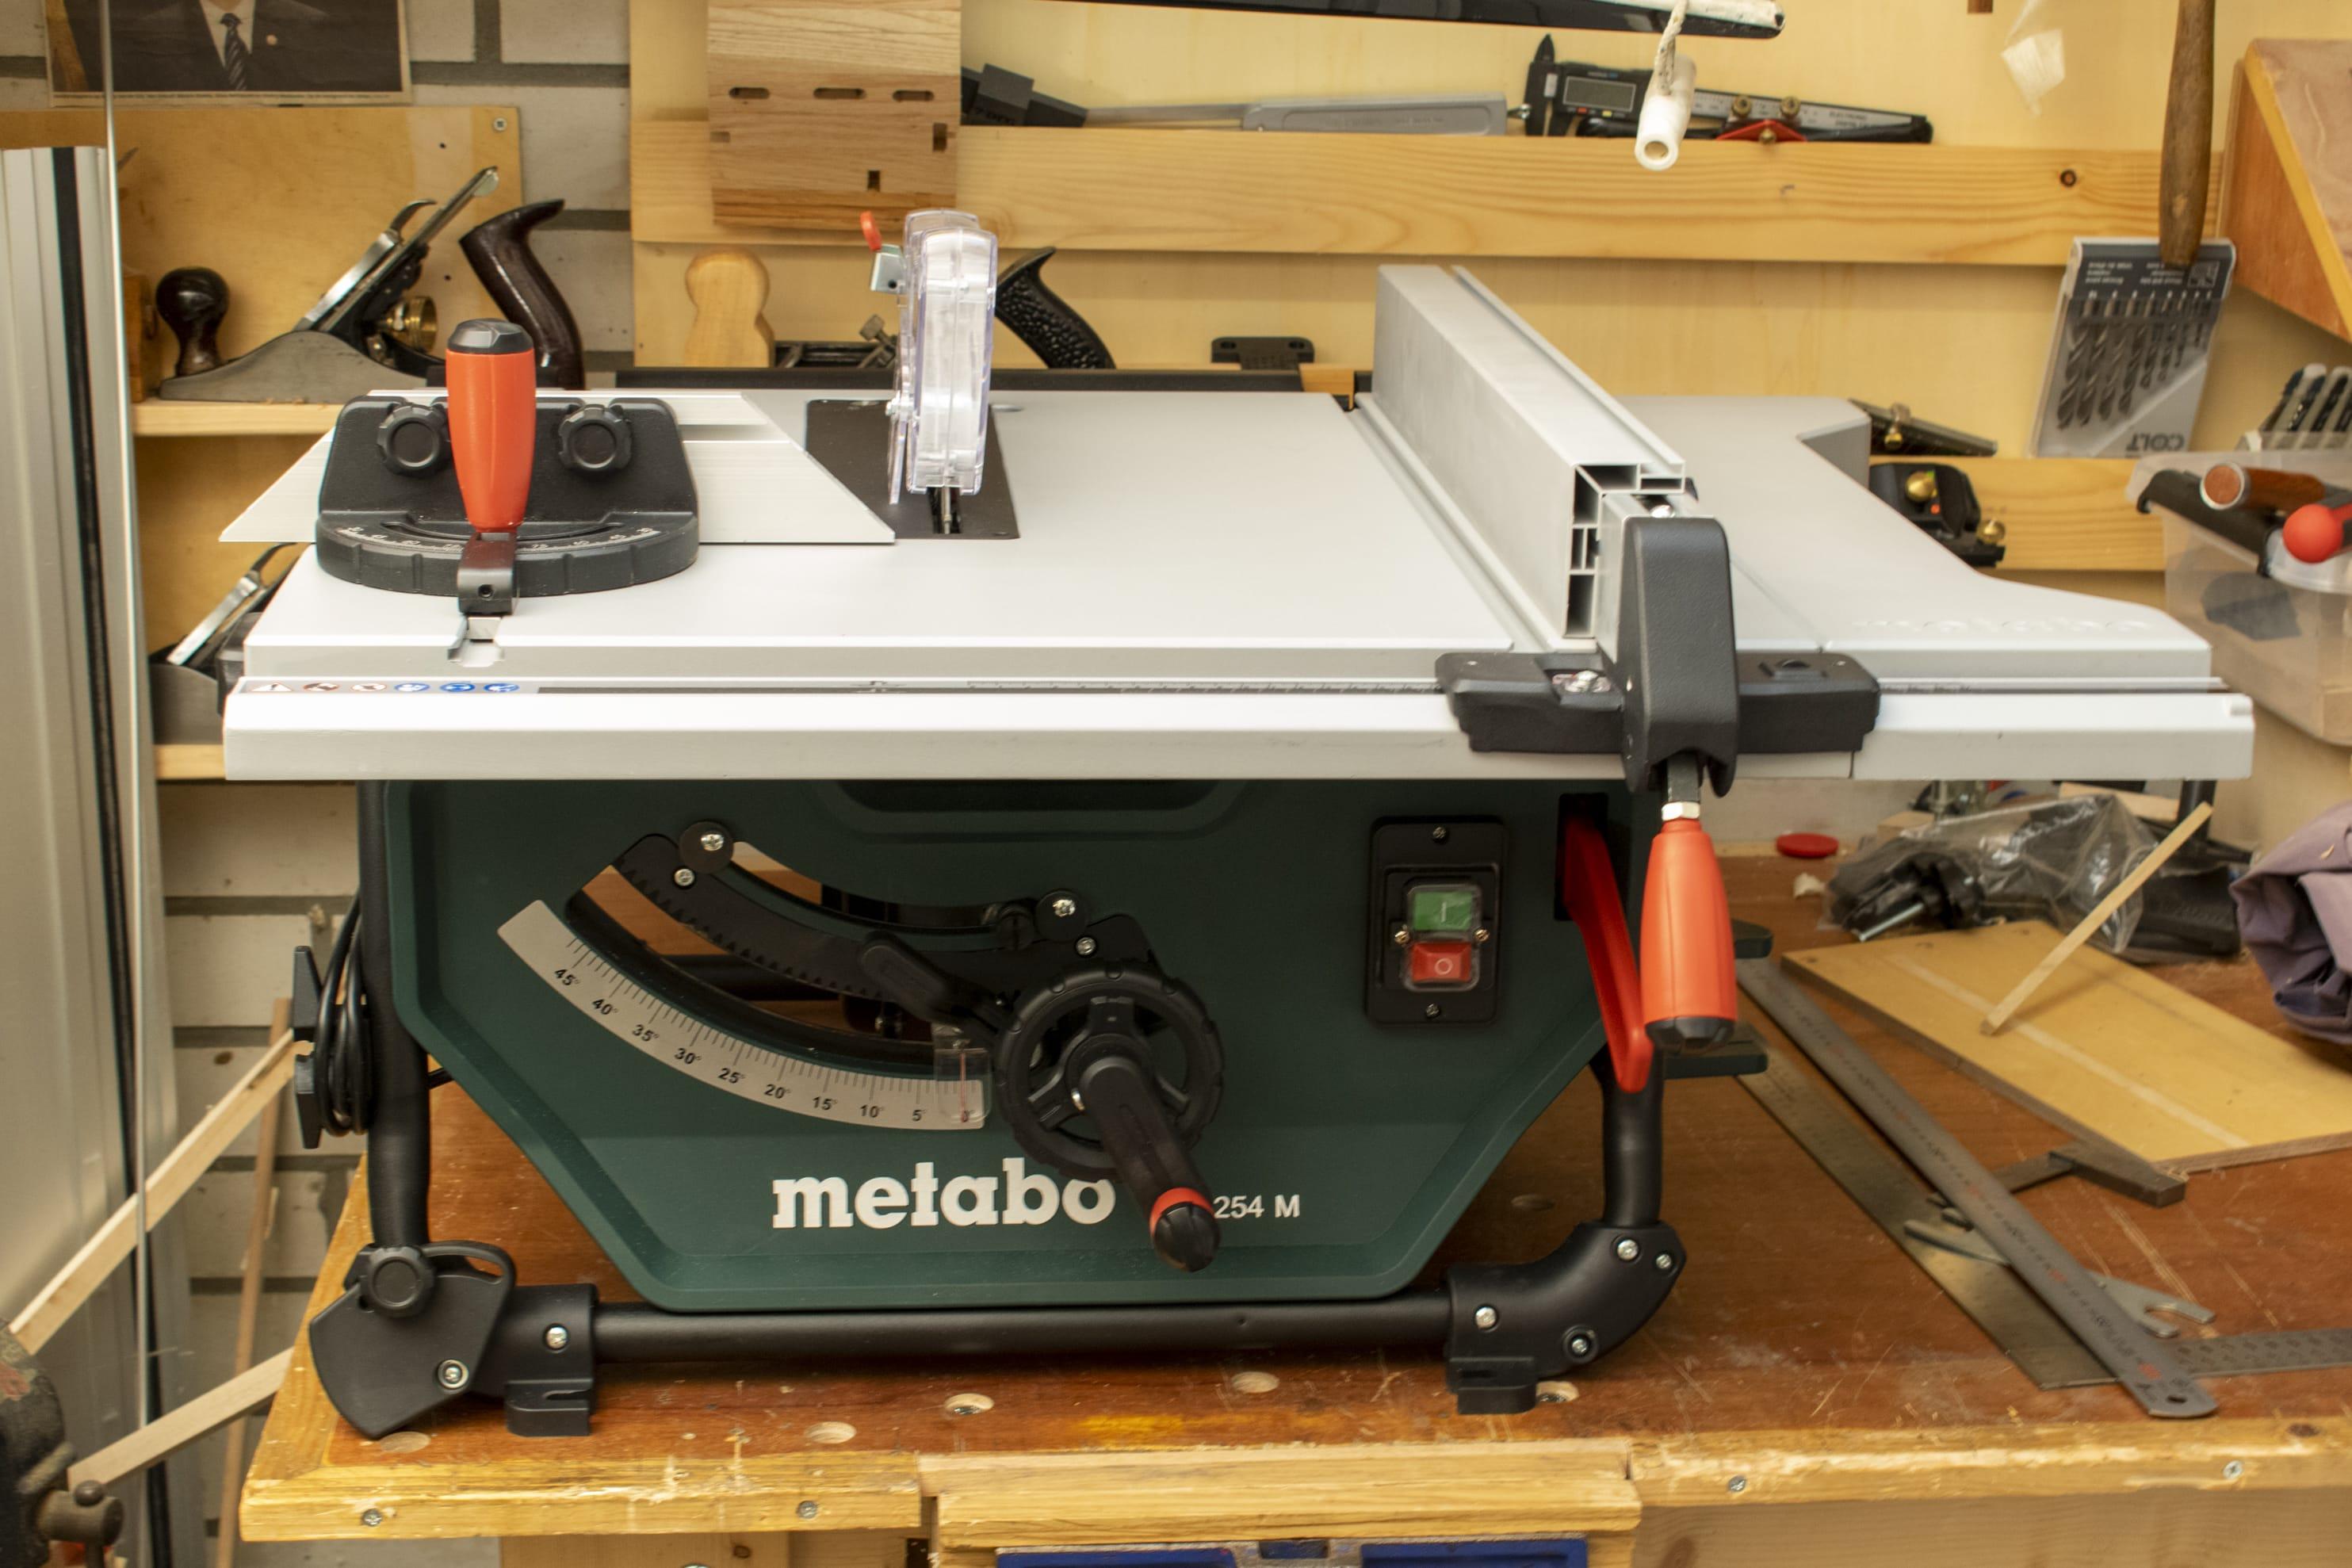 Metabo TS 254 M Table Saw 9.jpg